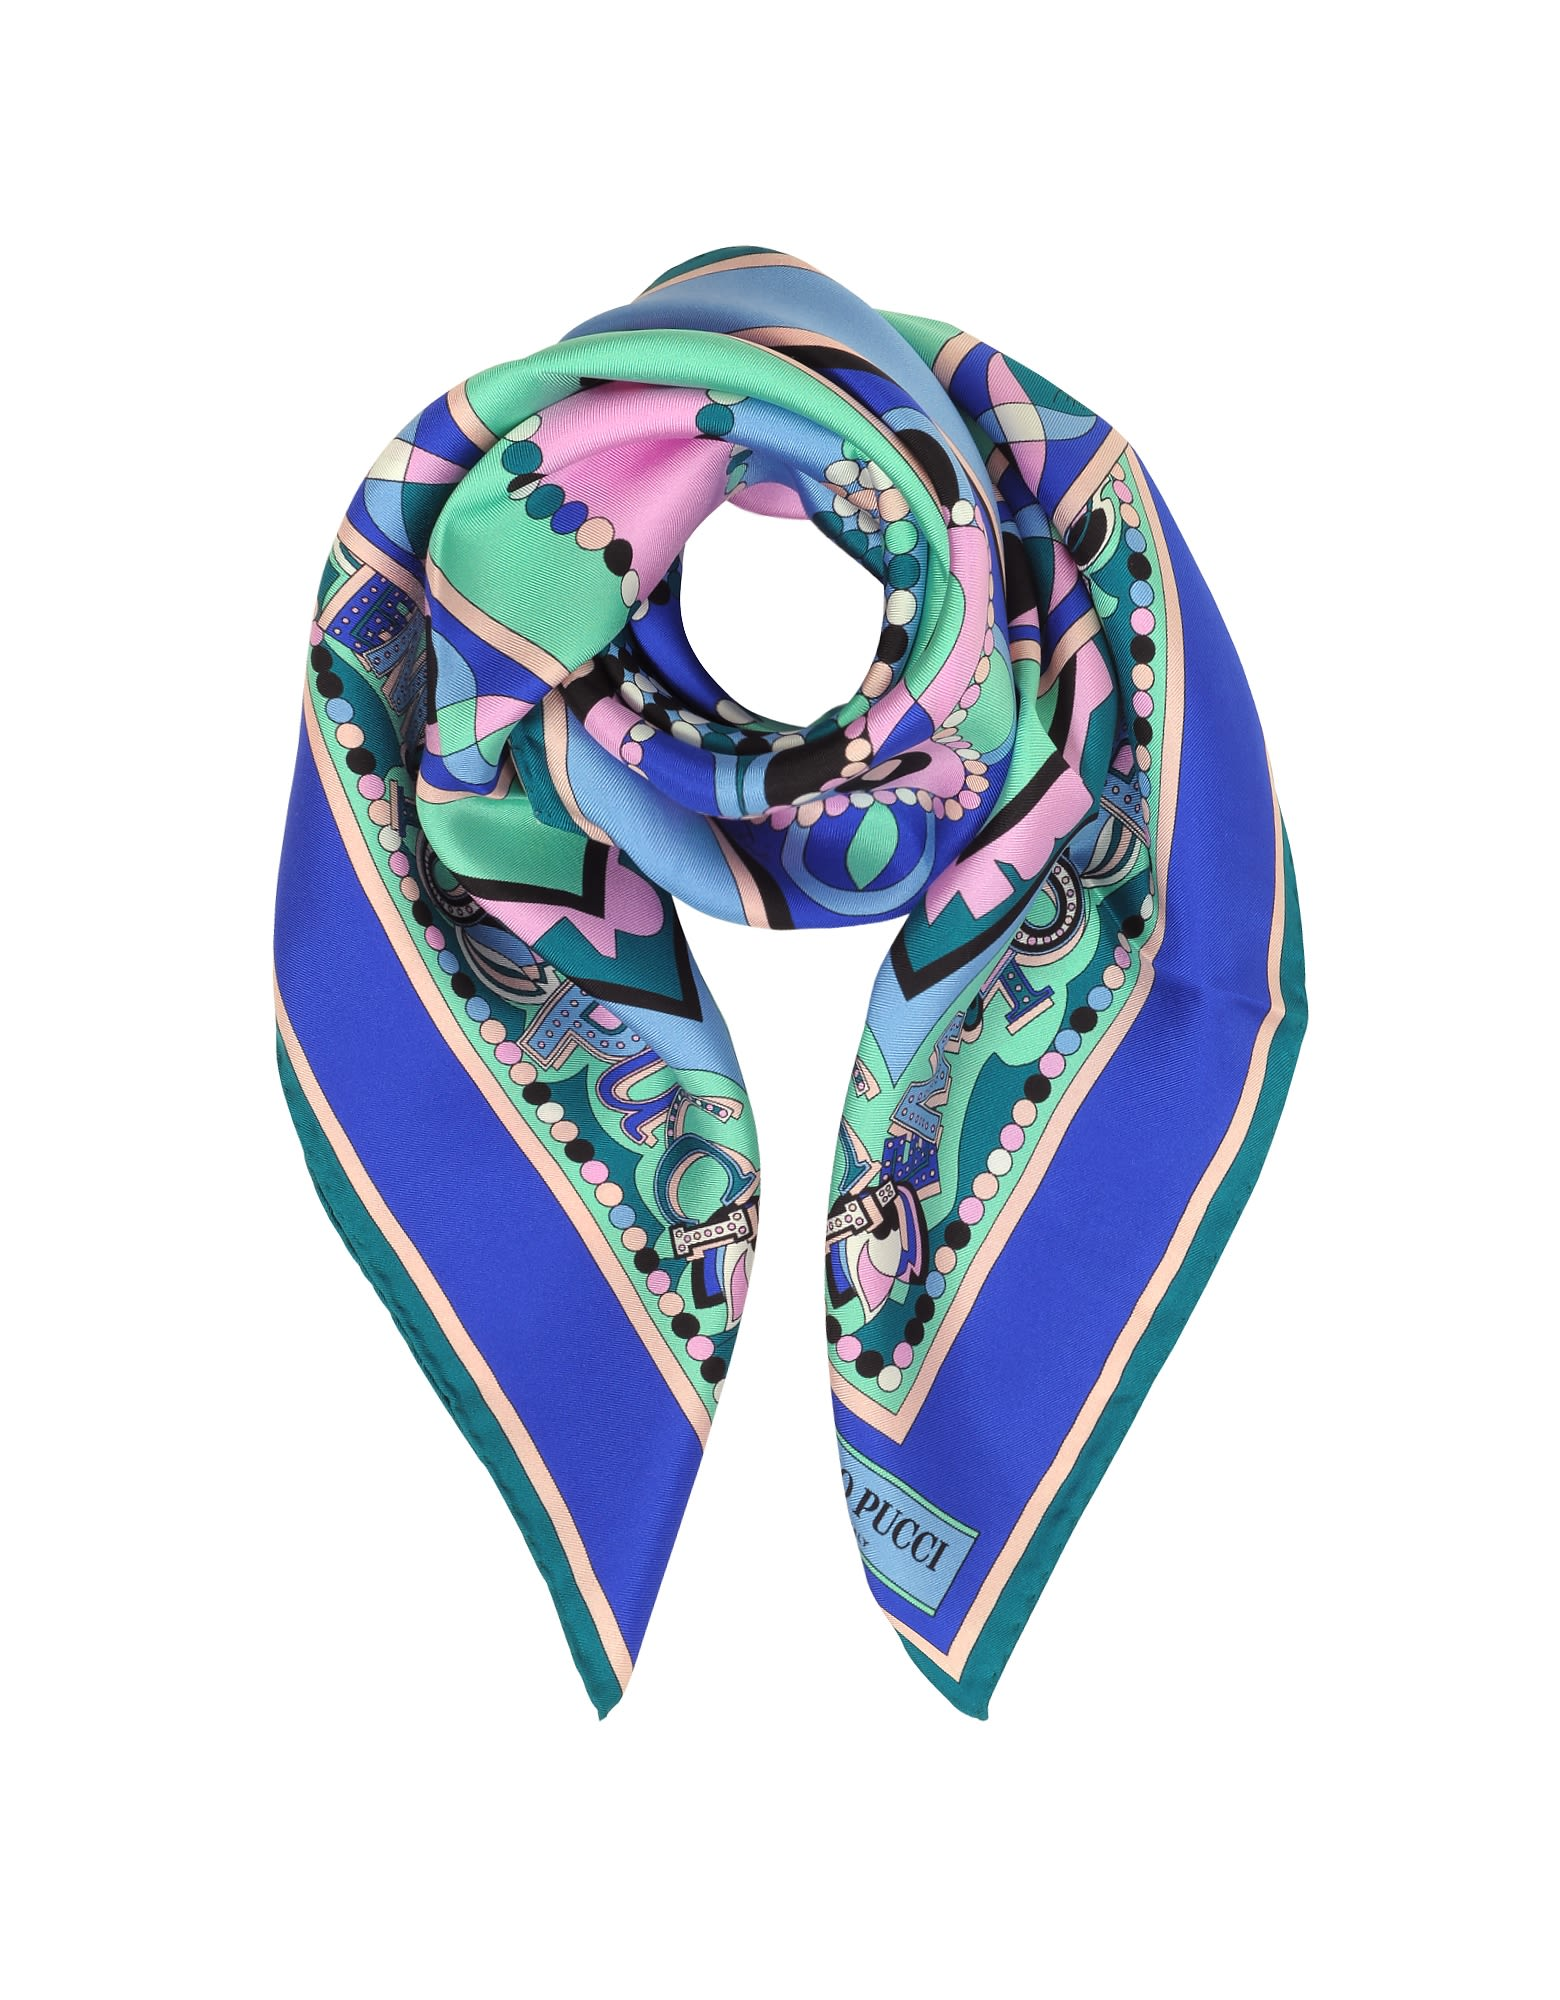 Emilio Pucci Cobalt Blue/peony Pink Geometric And Signature Printed Silk Square Scarf